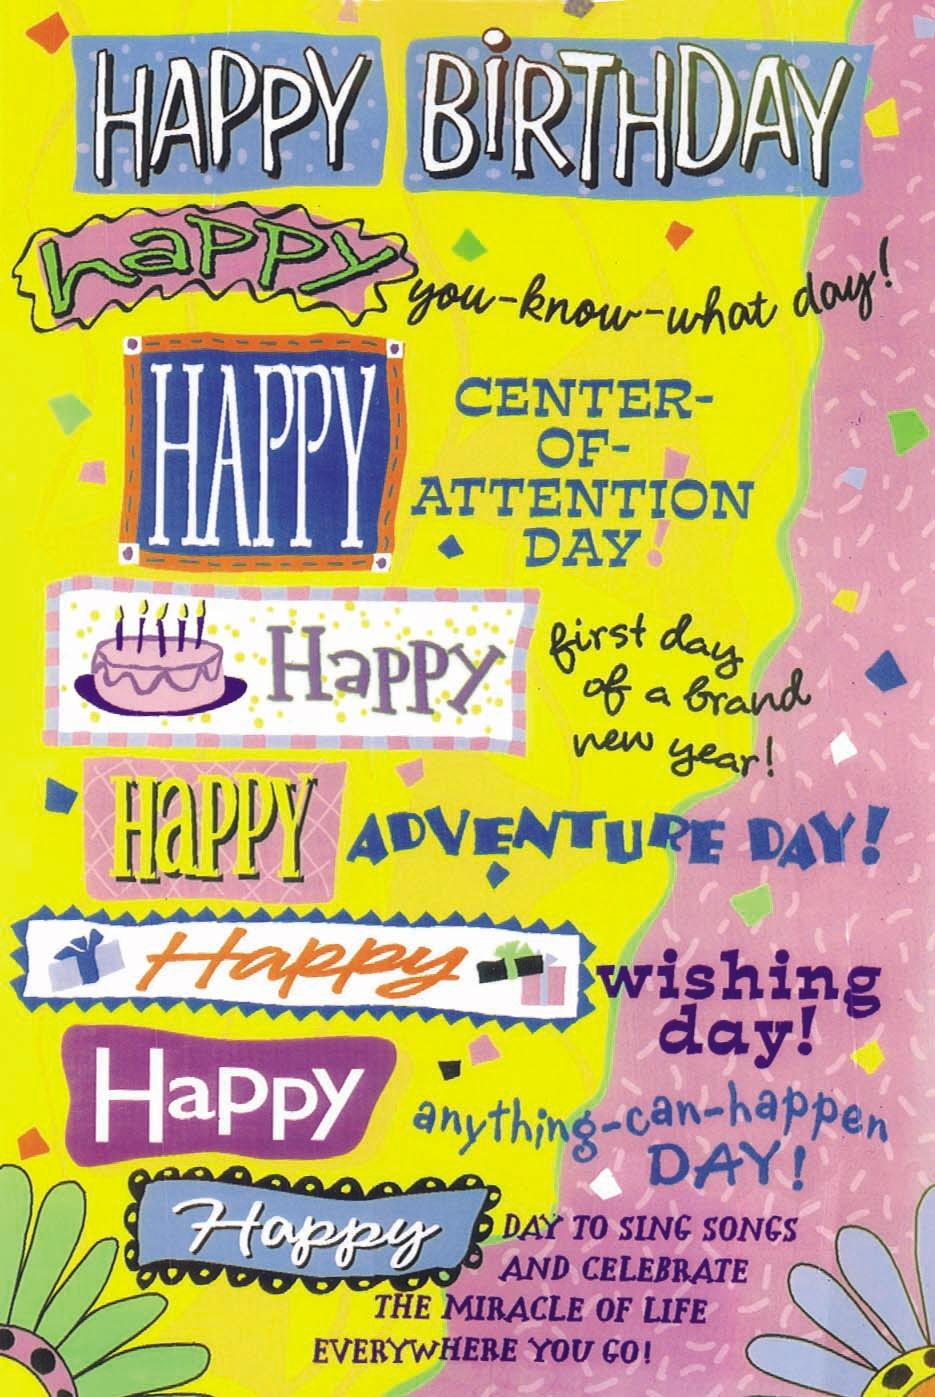 American Greetings Birthday Cards gangcraftnet – American Greetings Birthday Cards